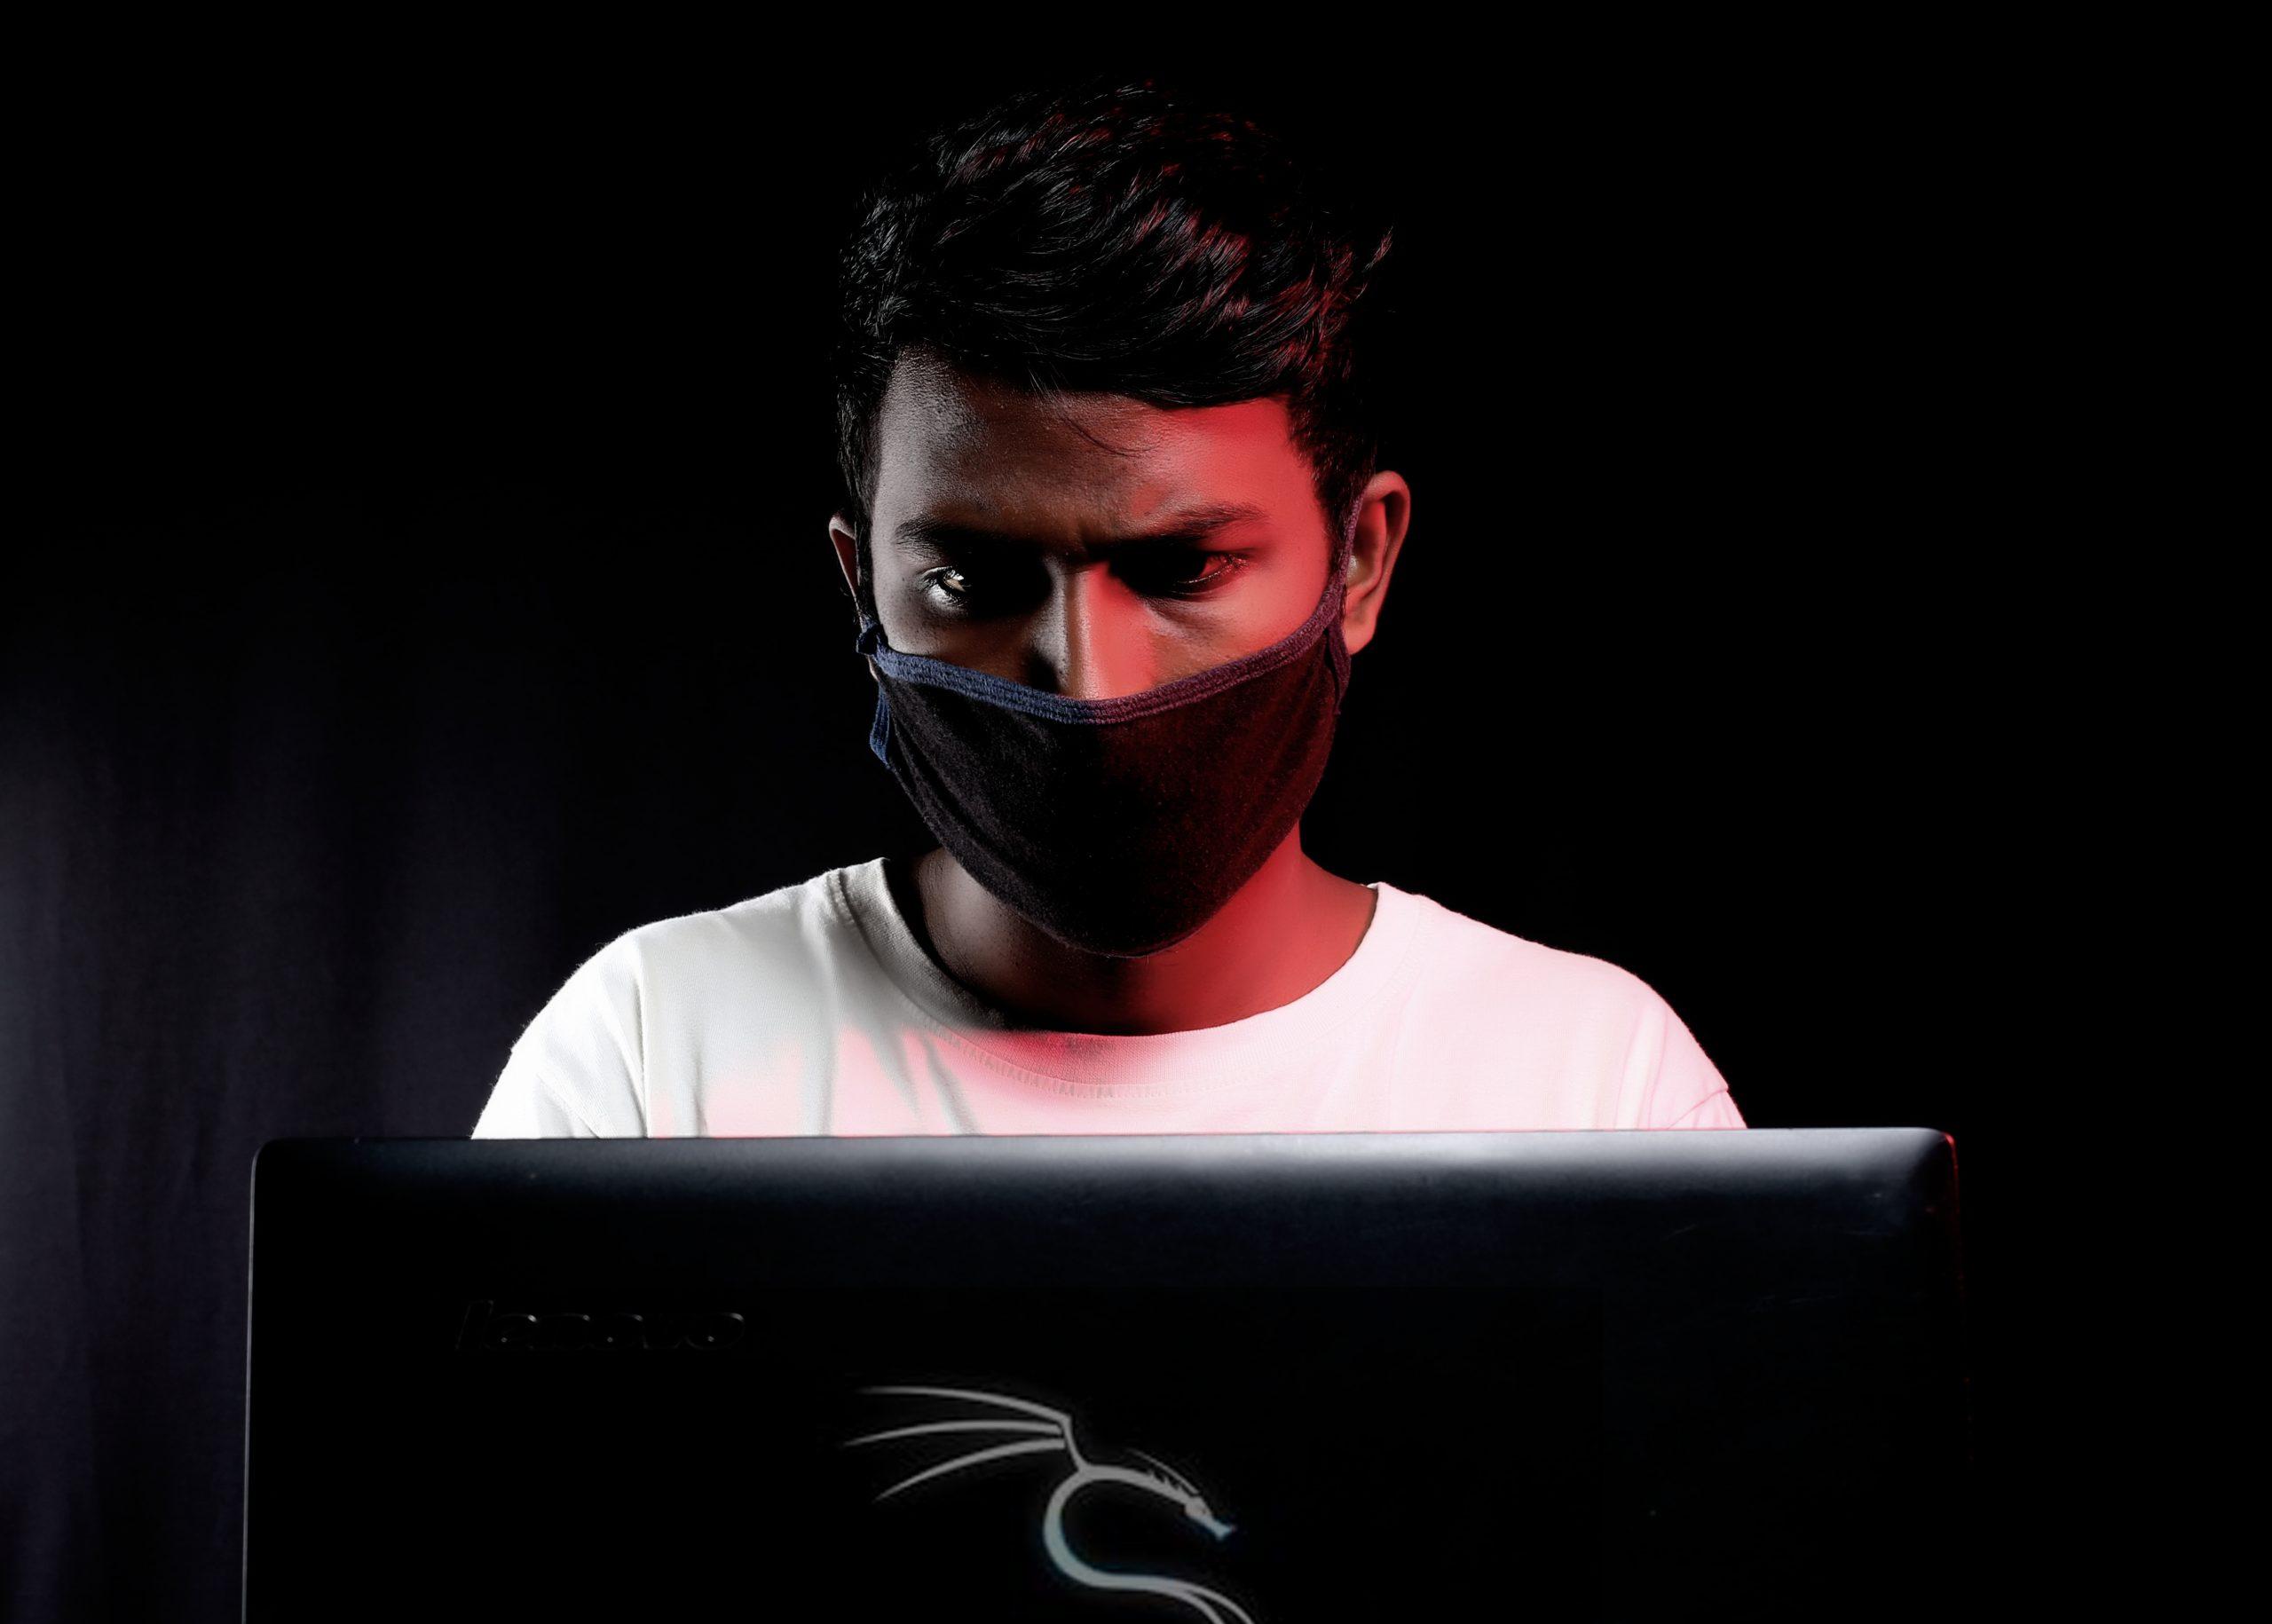 Man in a Laptop